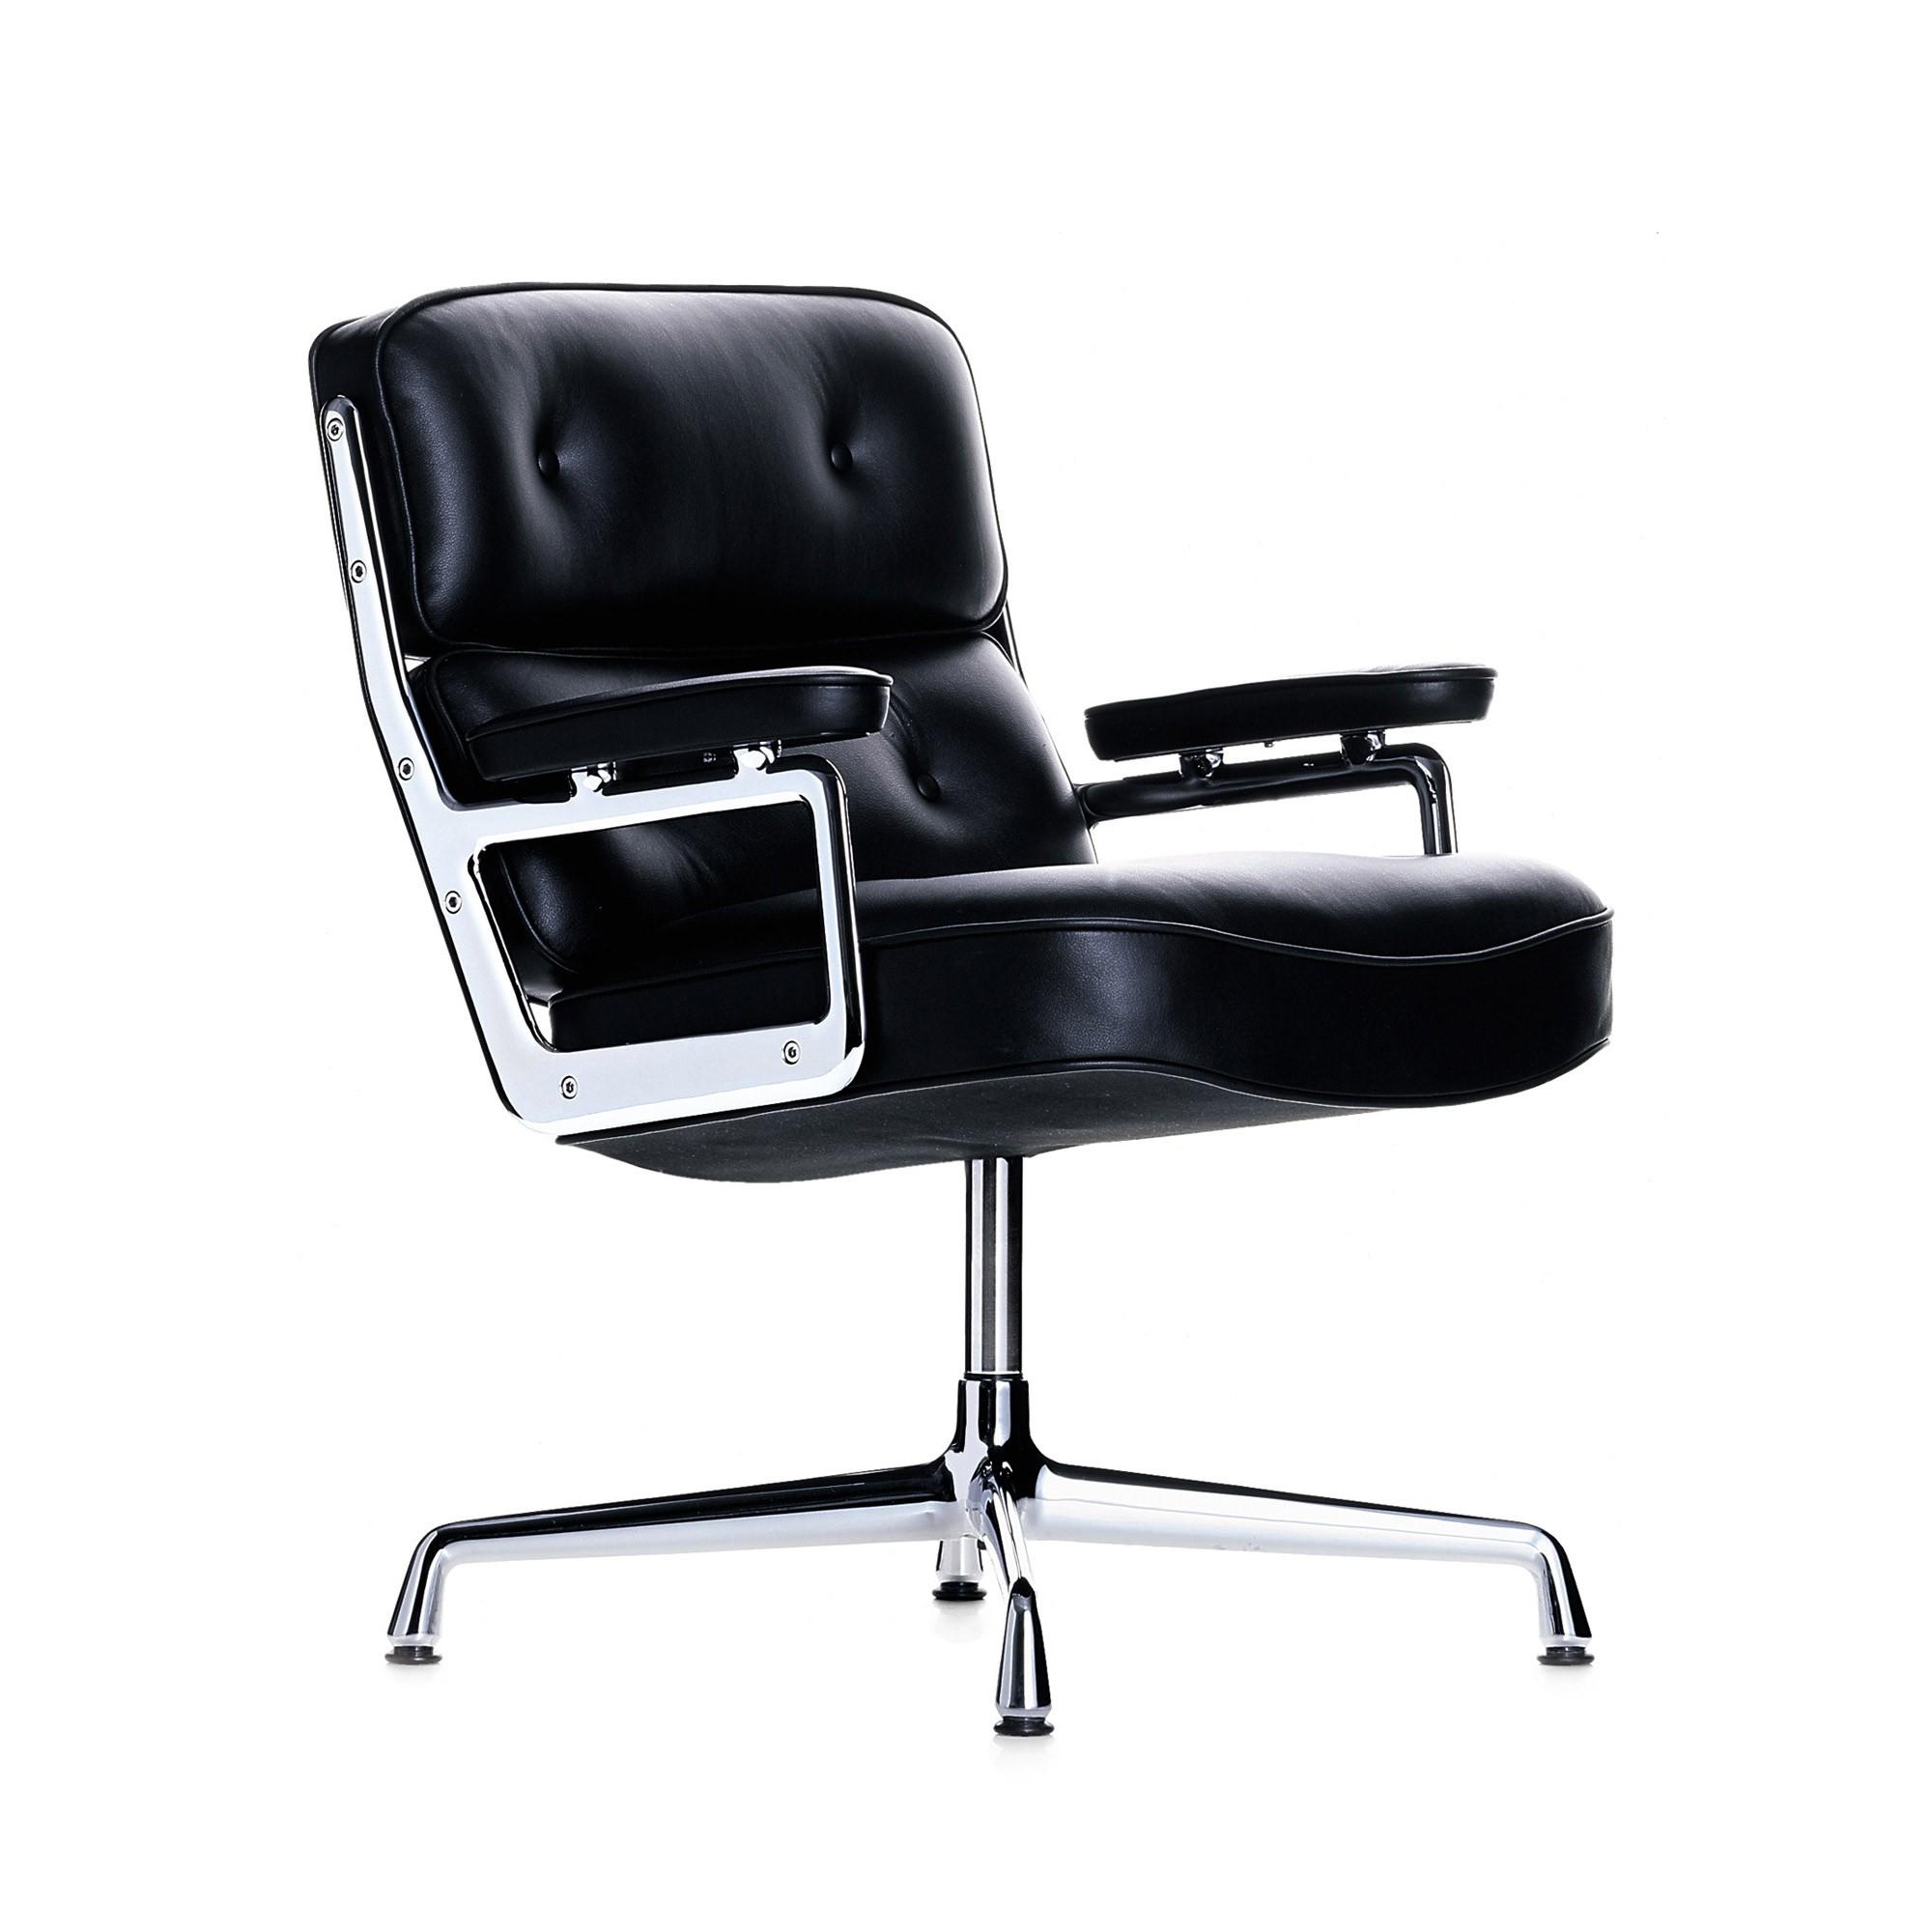 Vitra Eames Lobby Chair